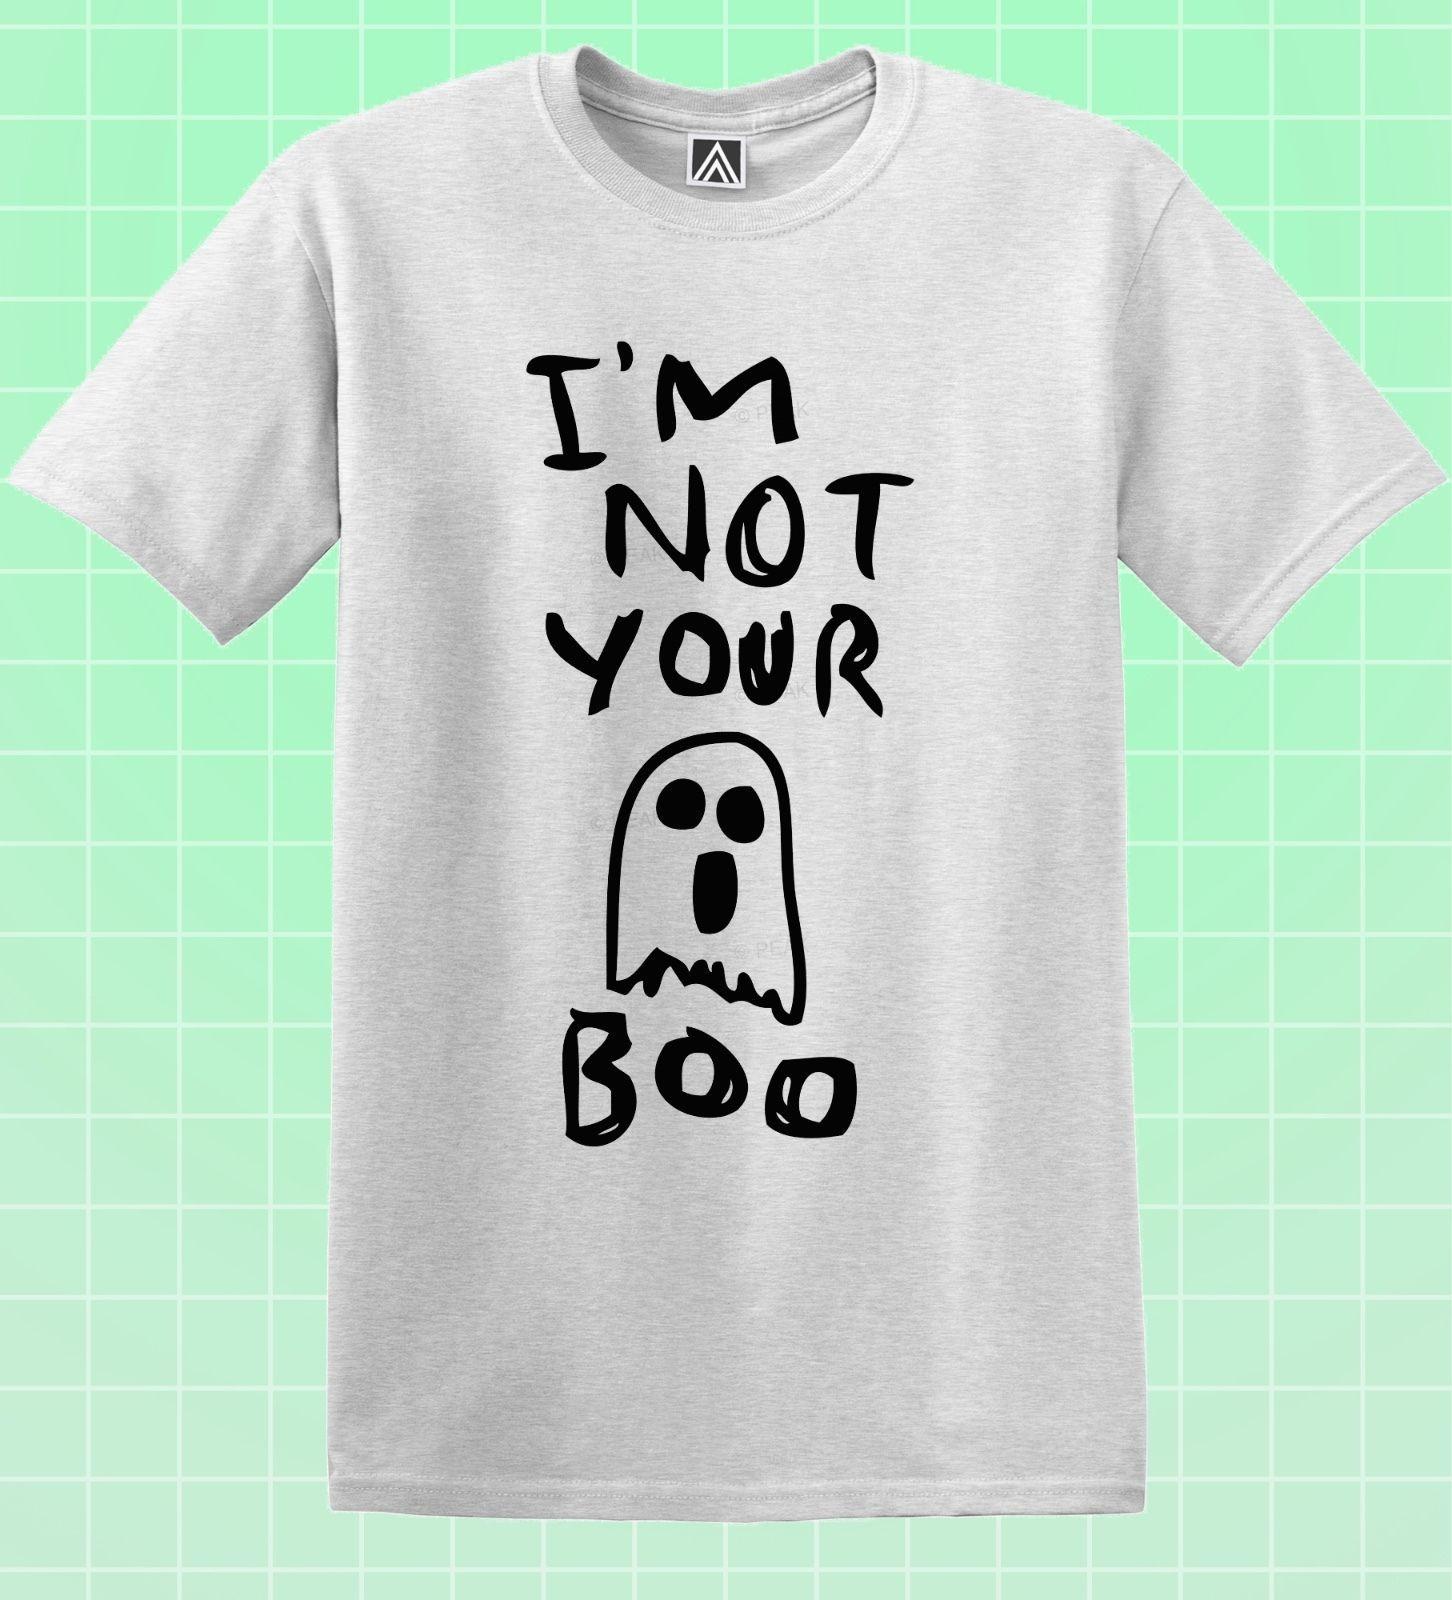 69199d5ee Not Your Boo T Shirt Ghost Cute Halloween Fancy Dress Tee Skater Bae Indie  Top Funny 100% Cotton T Shirt Cattt Windbreaker Pug Tshirt Shirt On T Shirt  ...